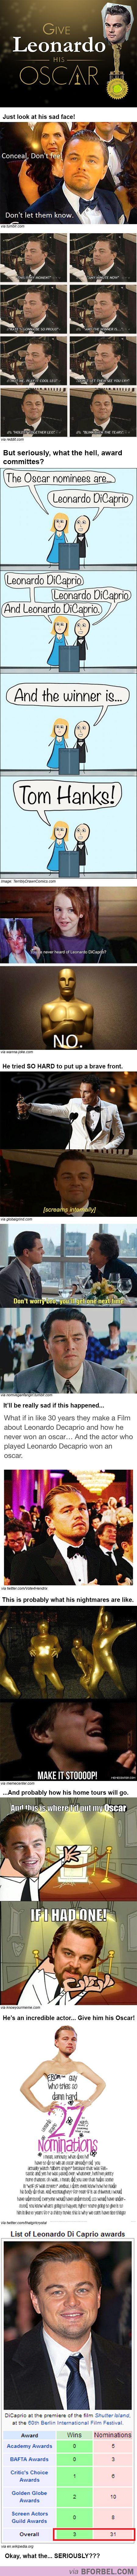 Give him his Oscar